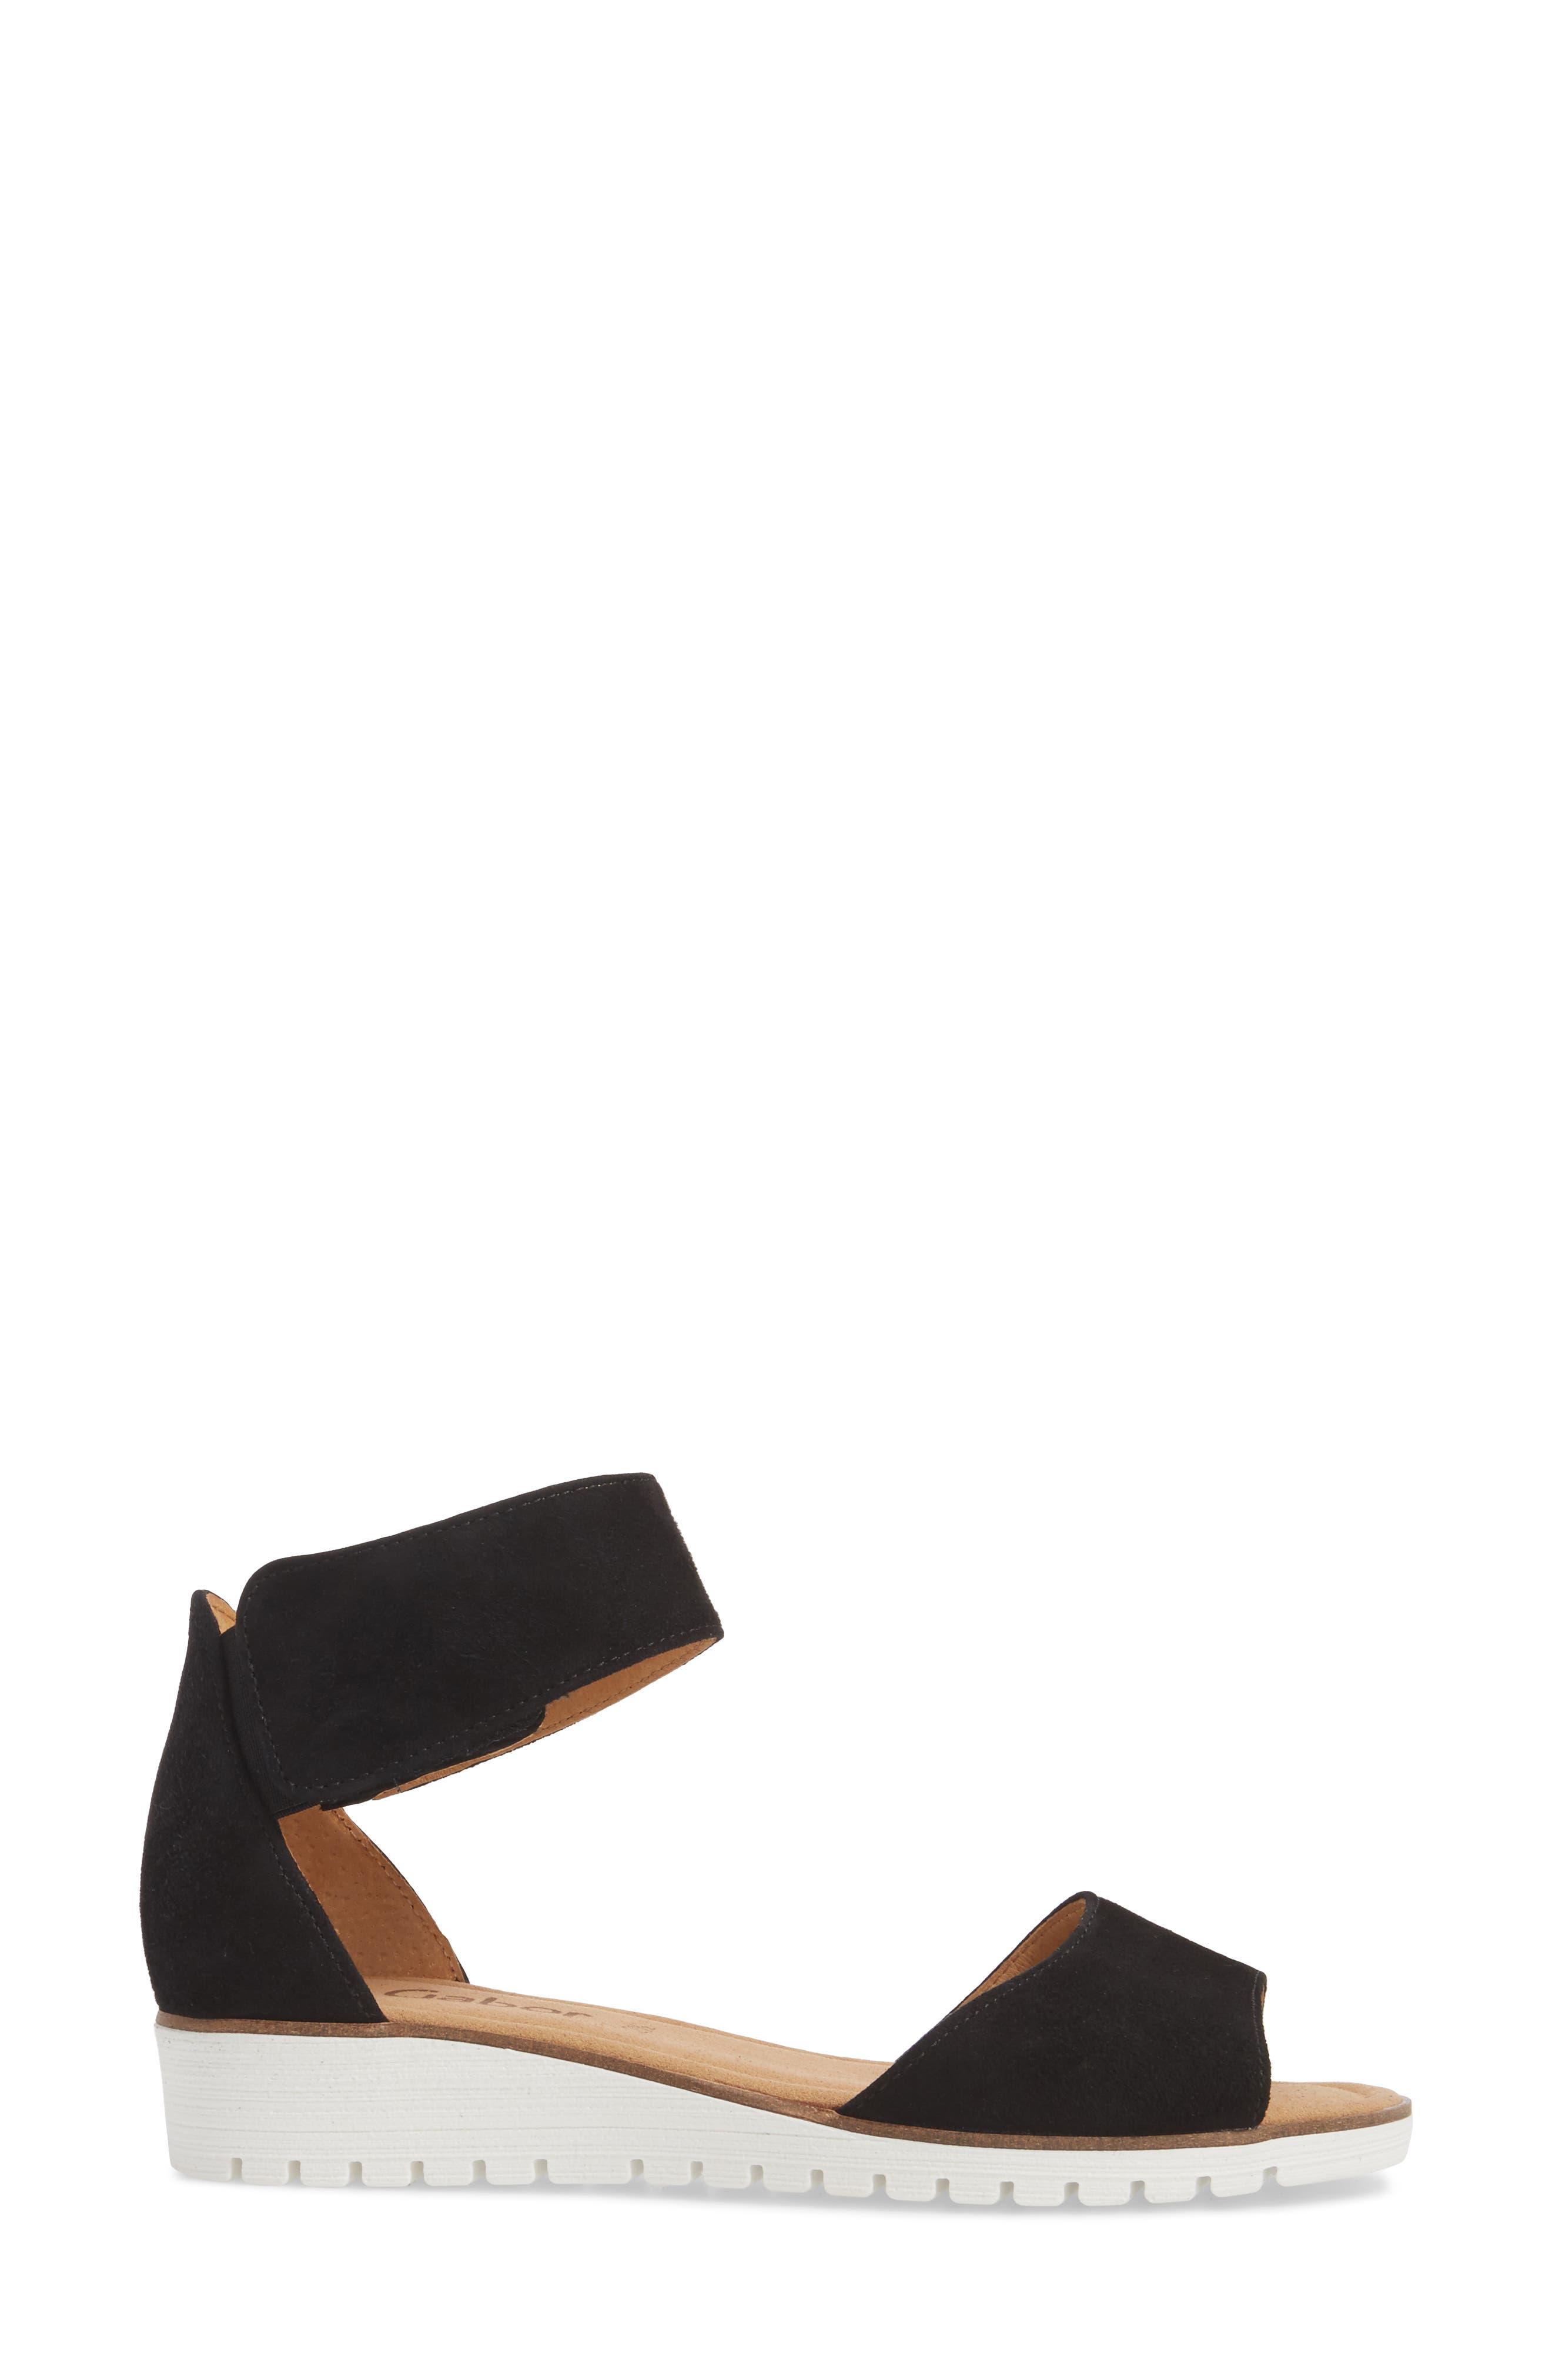 Ankle Strap Sandal,                             Alternate thumbnail 3, color,                             BLACK SUEDE